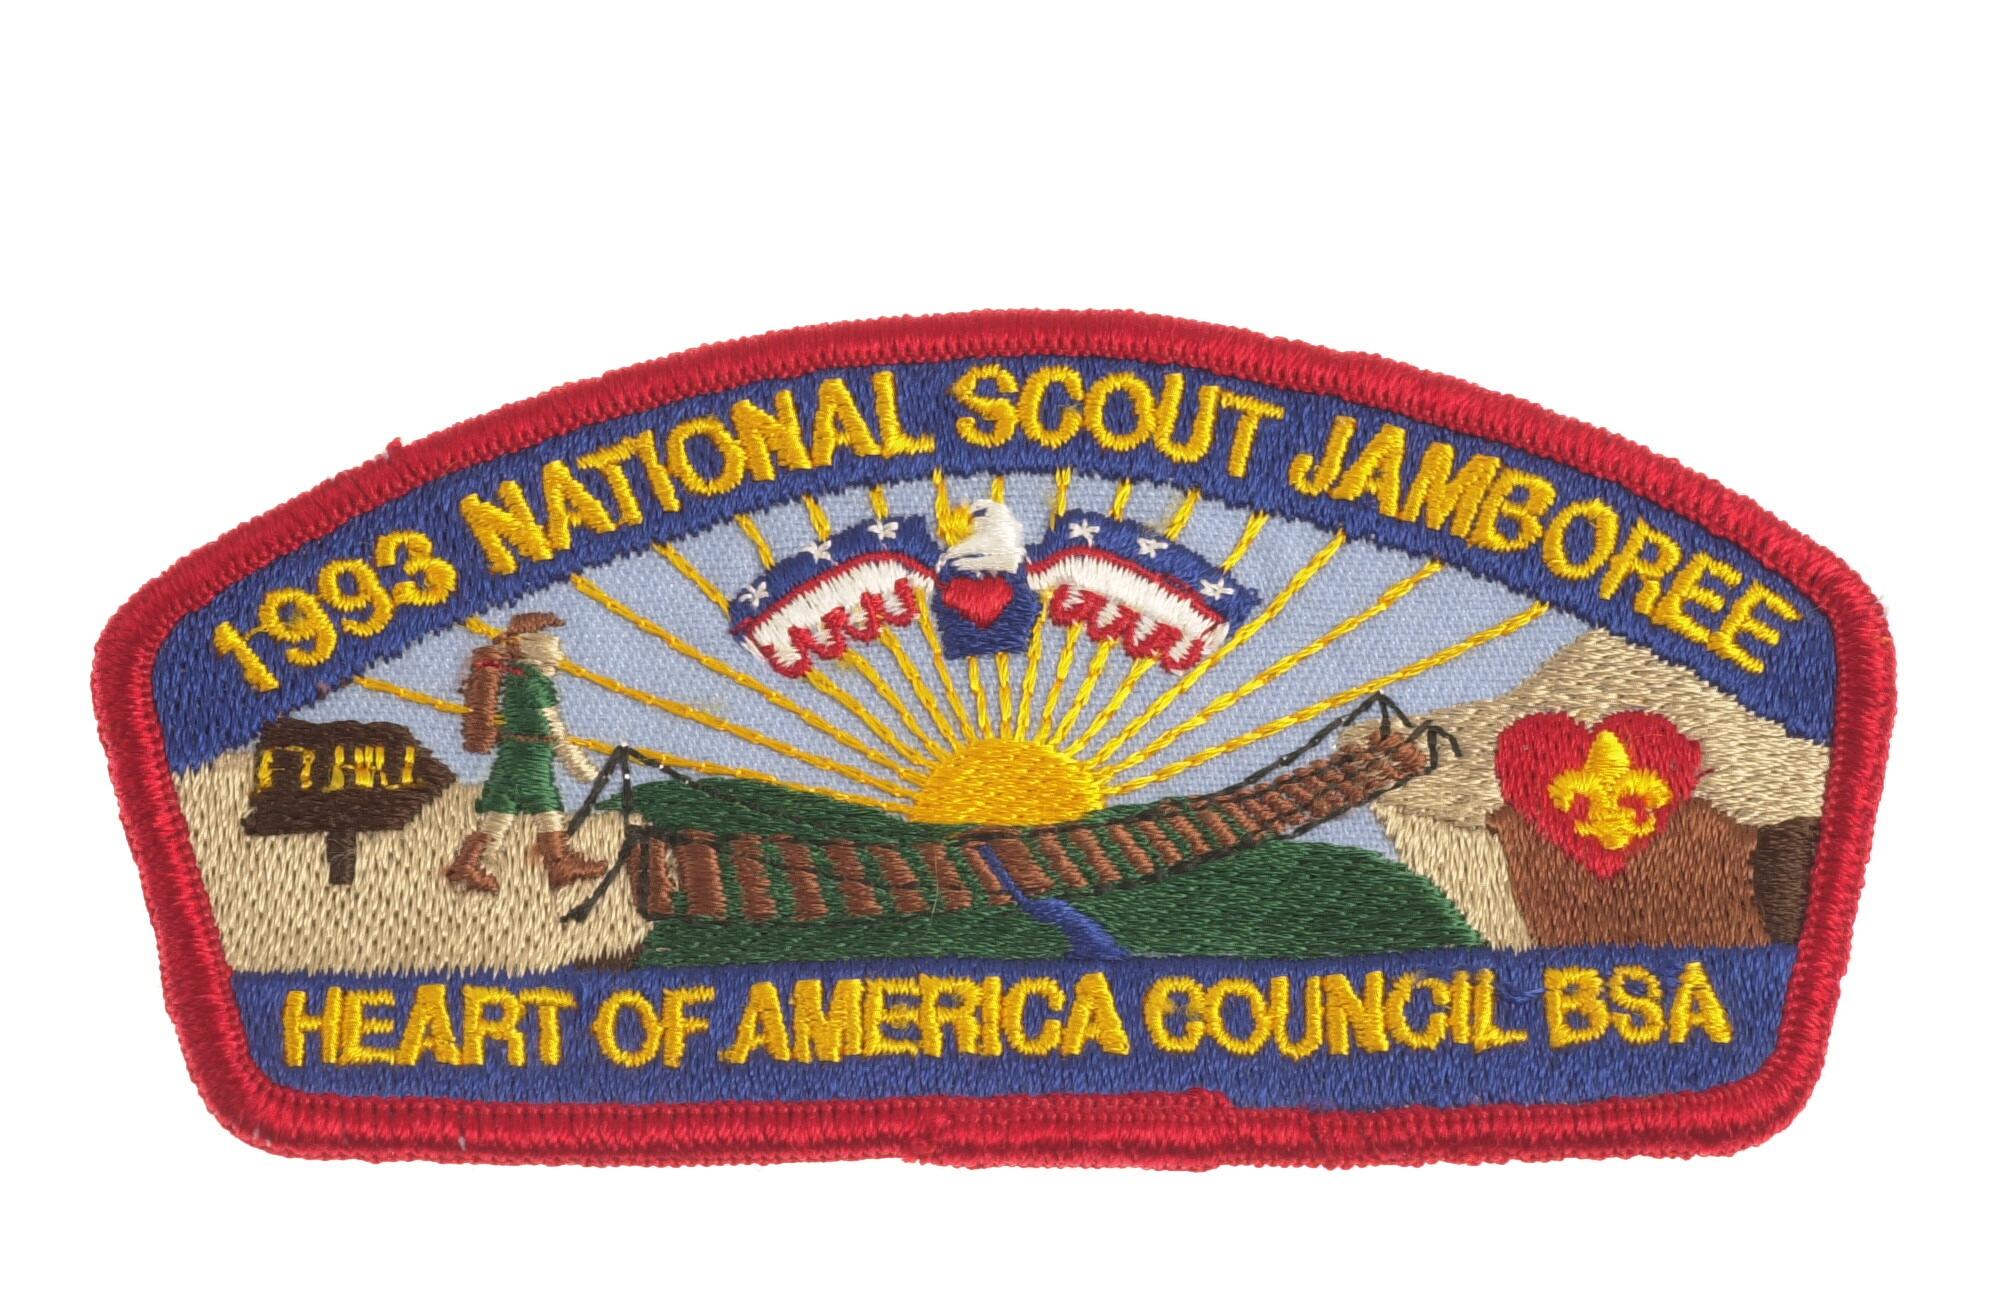 MINT 1985 JSP Mid America Council Yellow Border